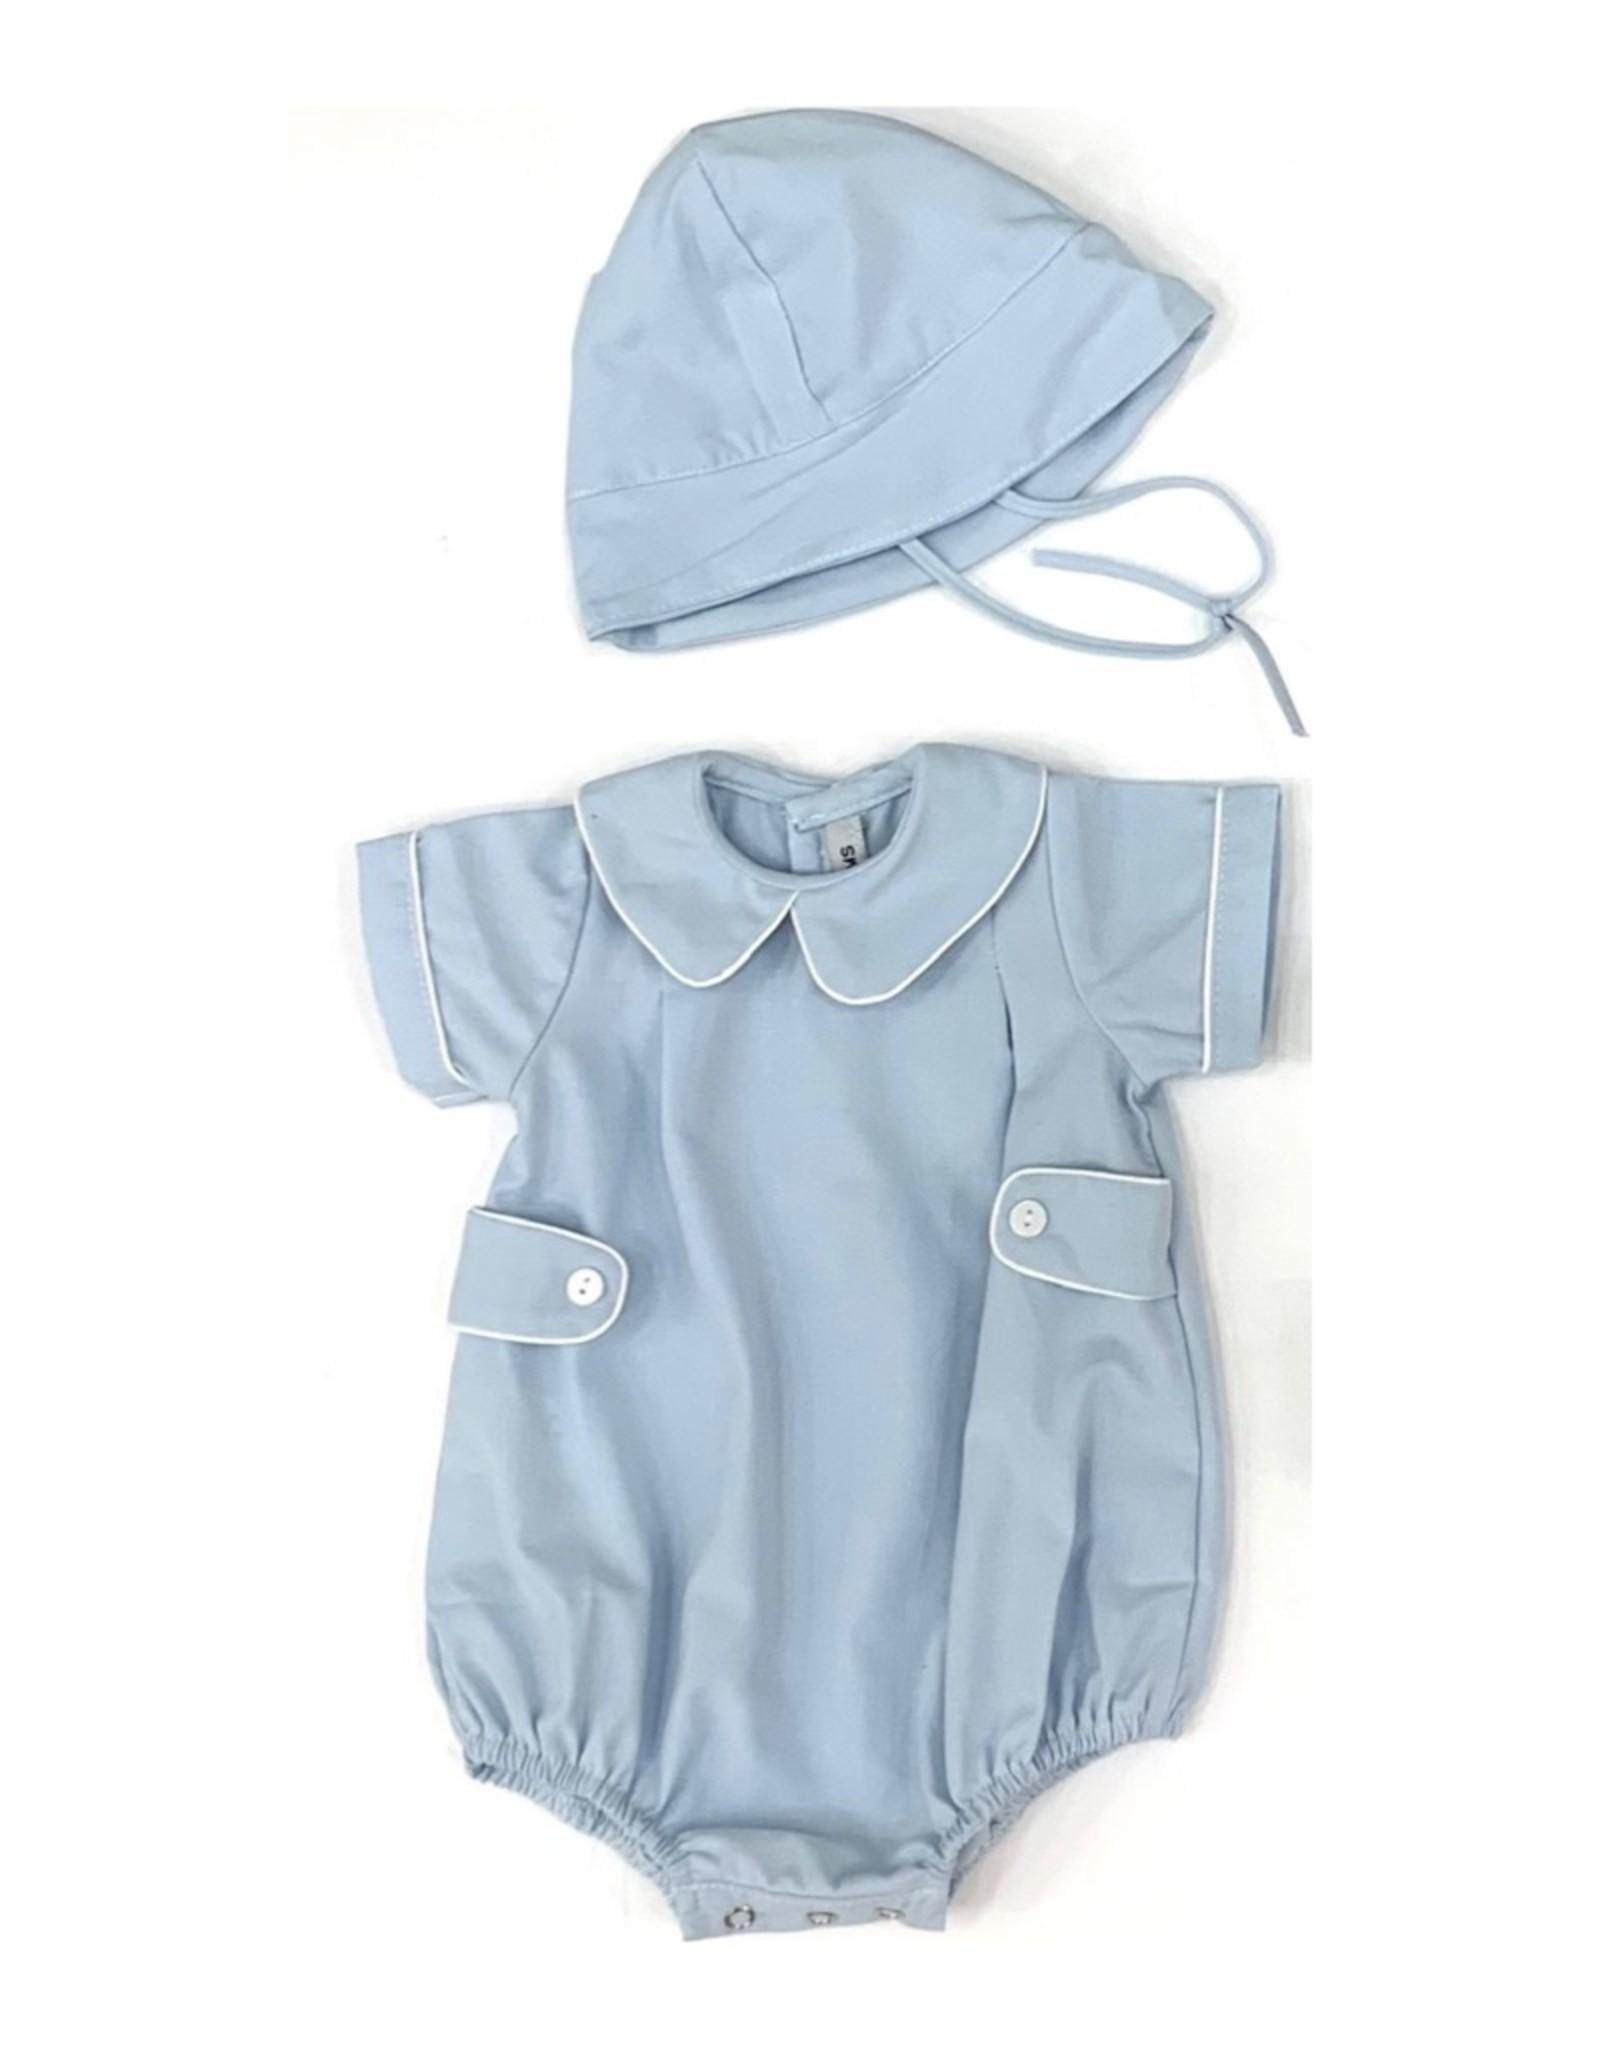 Sweet Dreams Blue Hemstitch Infant Set